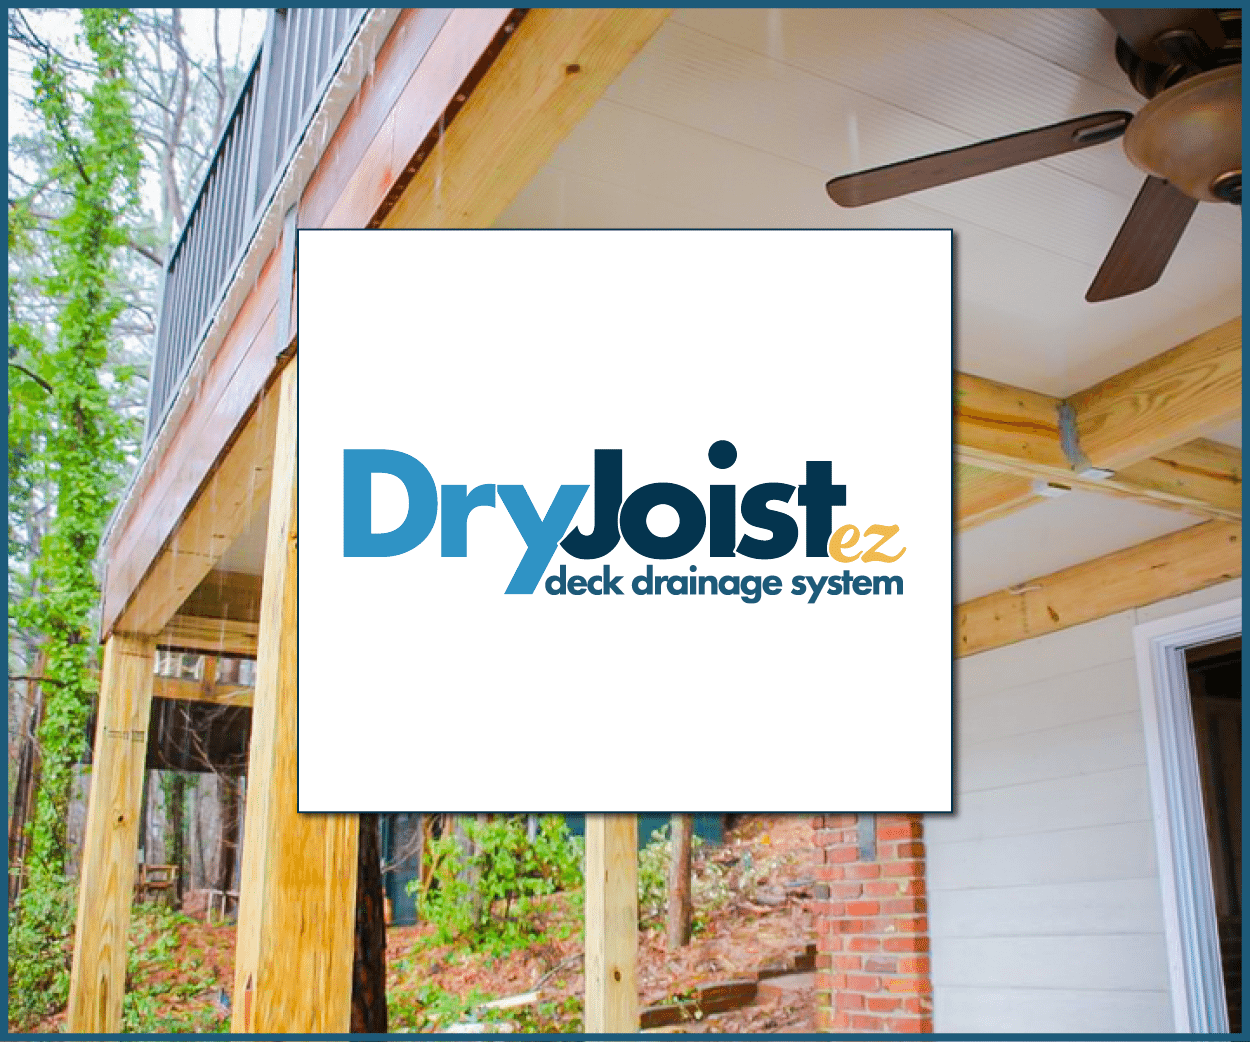 DryJoist EZ waterproof aluminum decking system square logo